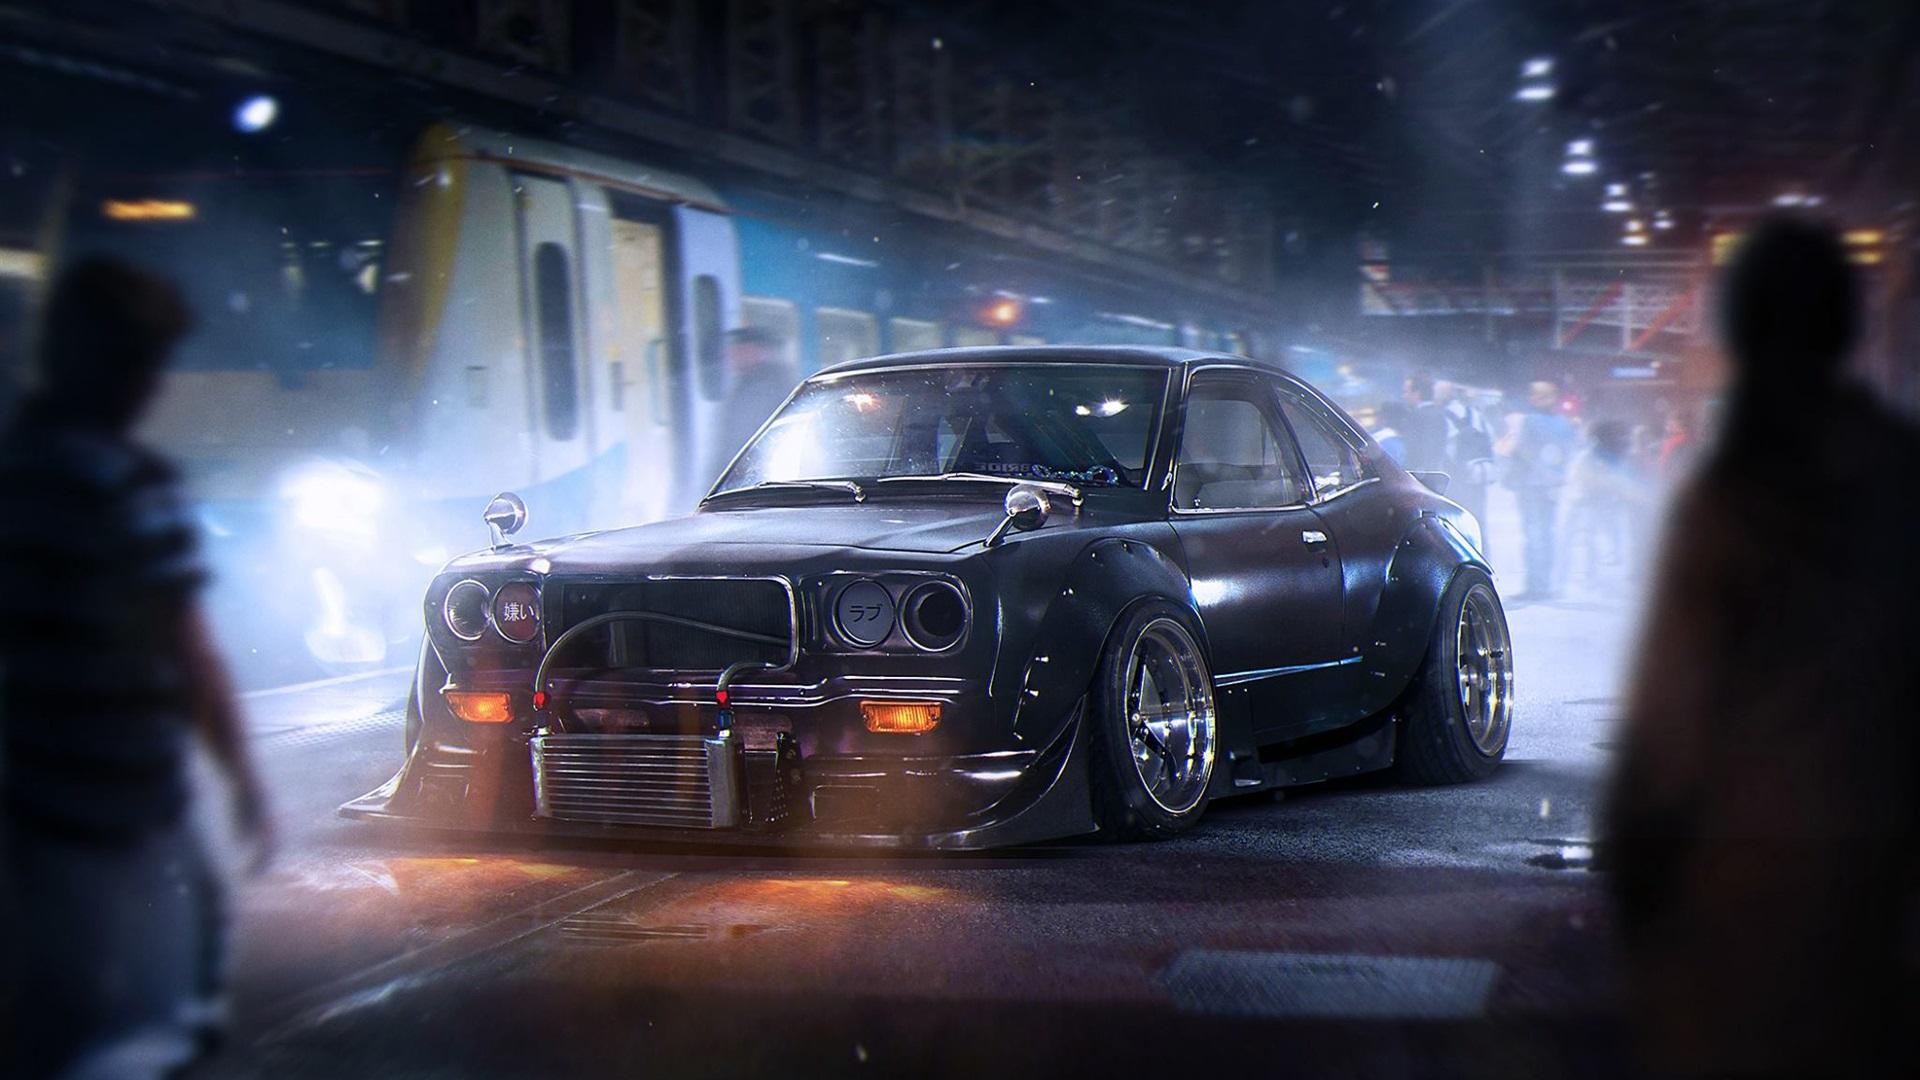 Wallpaper Mazda Rx 3 Black Car Night City 1920x1080 Full Hd 2k